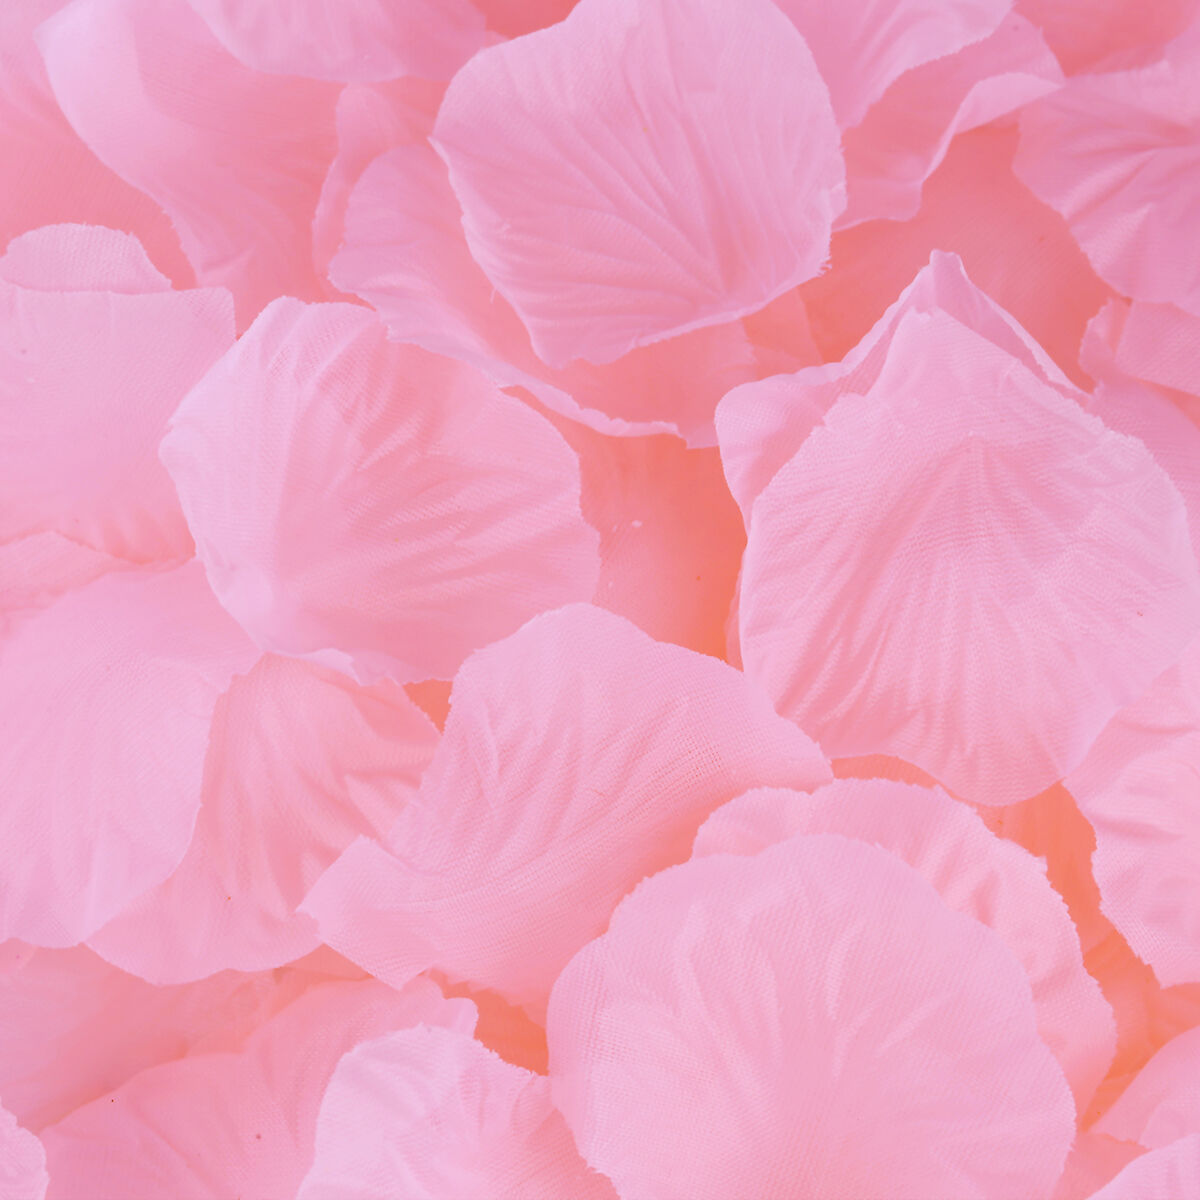 500 Silk Rose Petals Wedding Party Decoration Flower Vase Floral ...